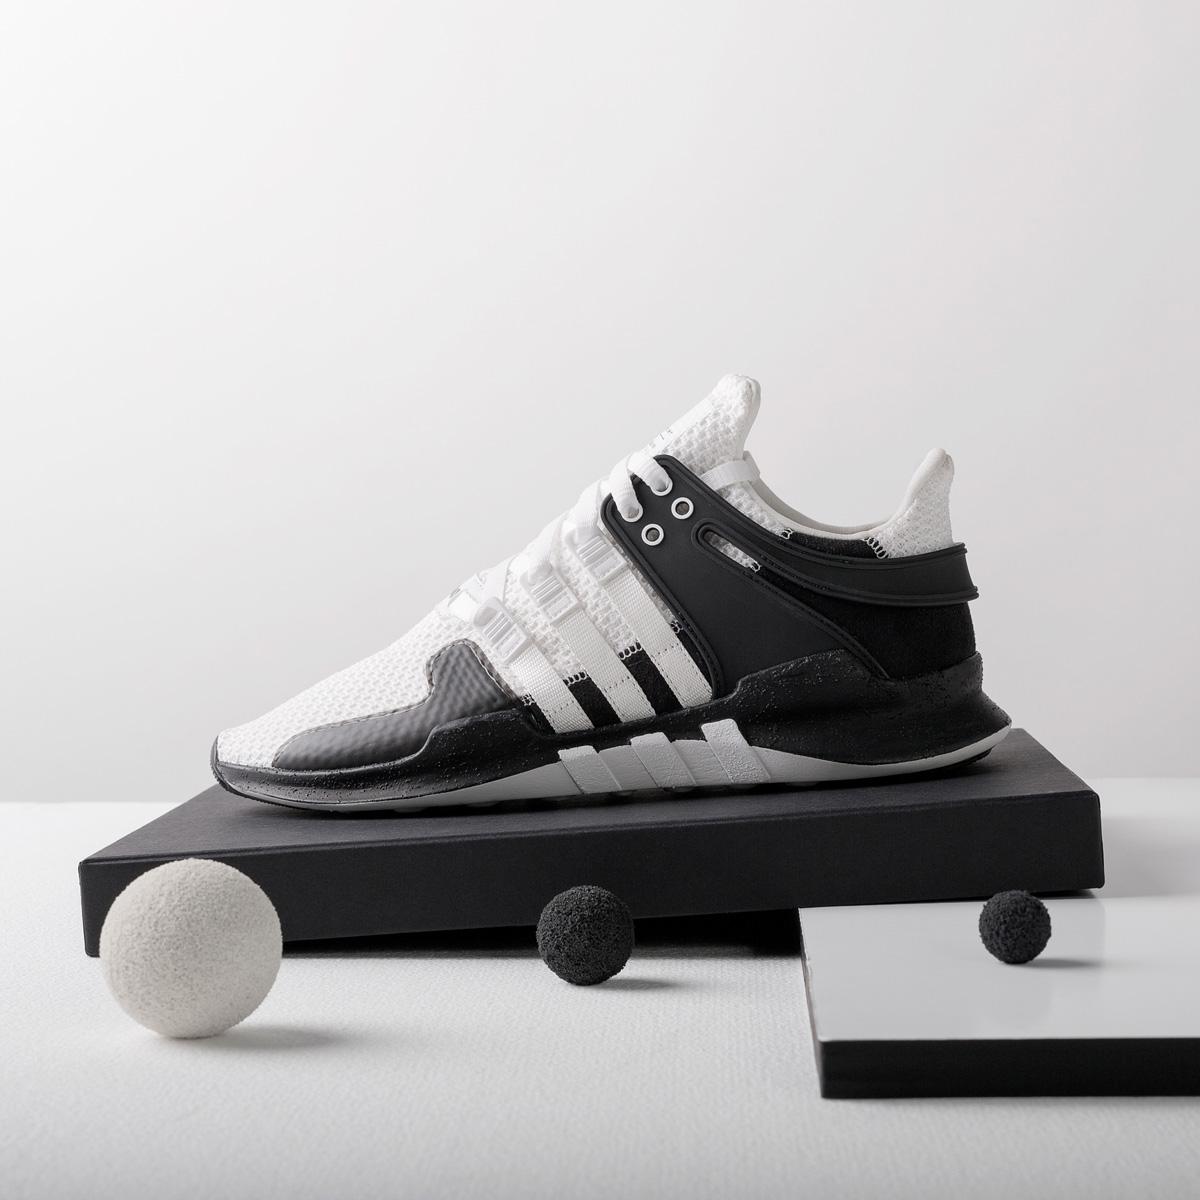 adidas x undefeated eqt adv